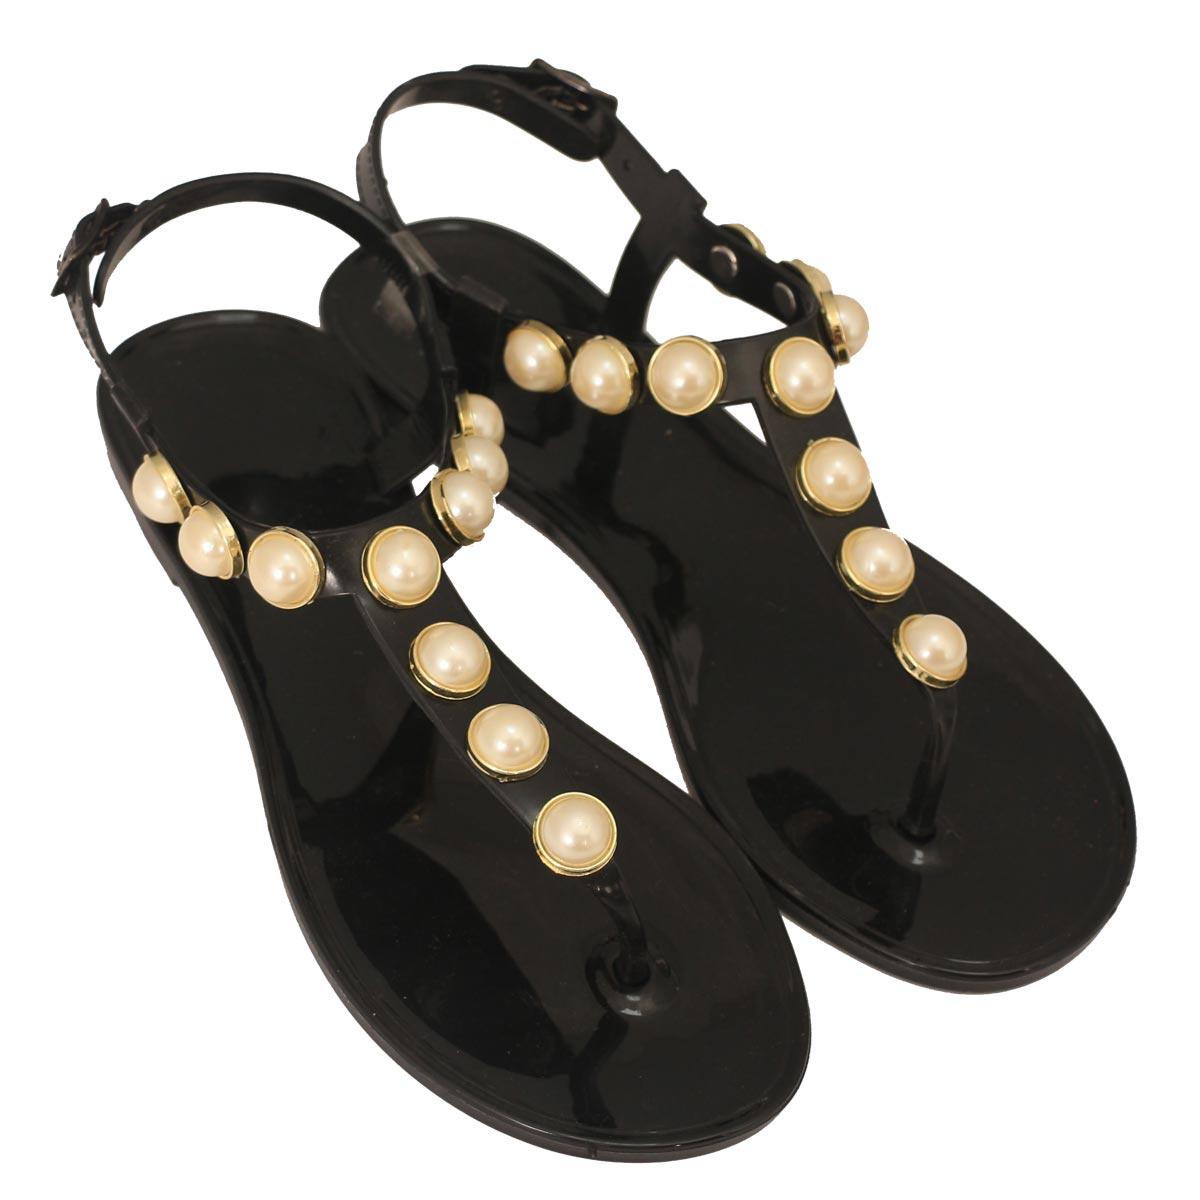 Bayan Sandalet Siyah 36 A101